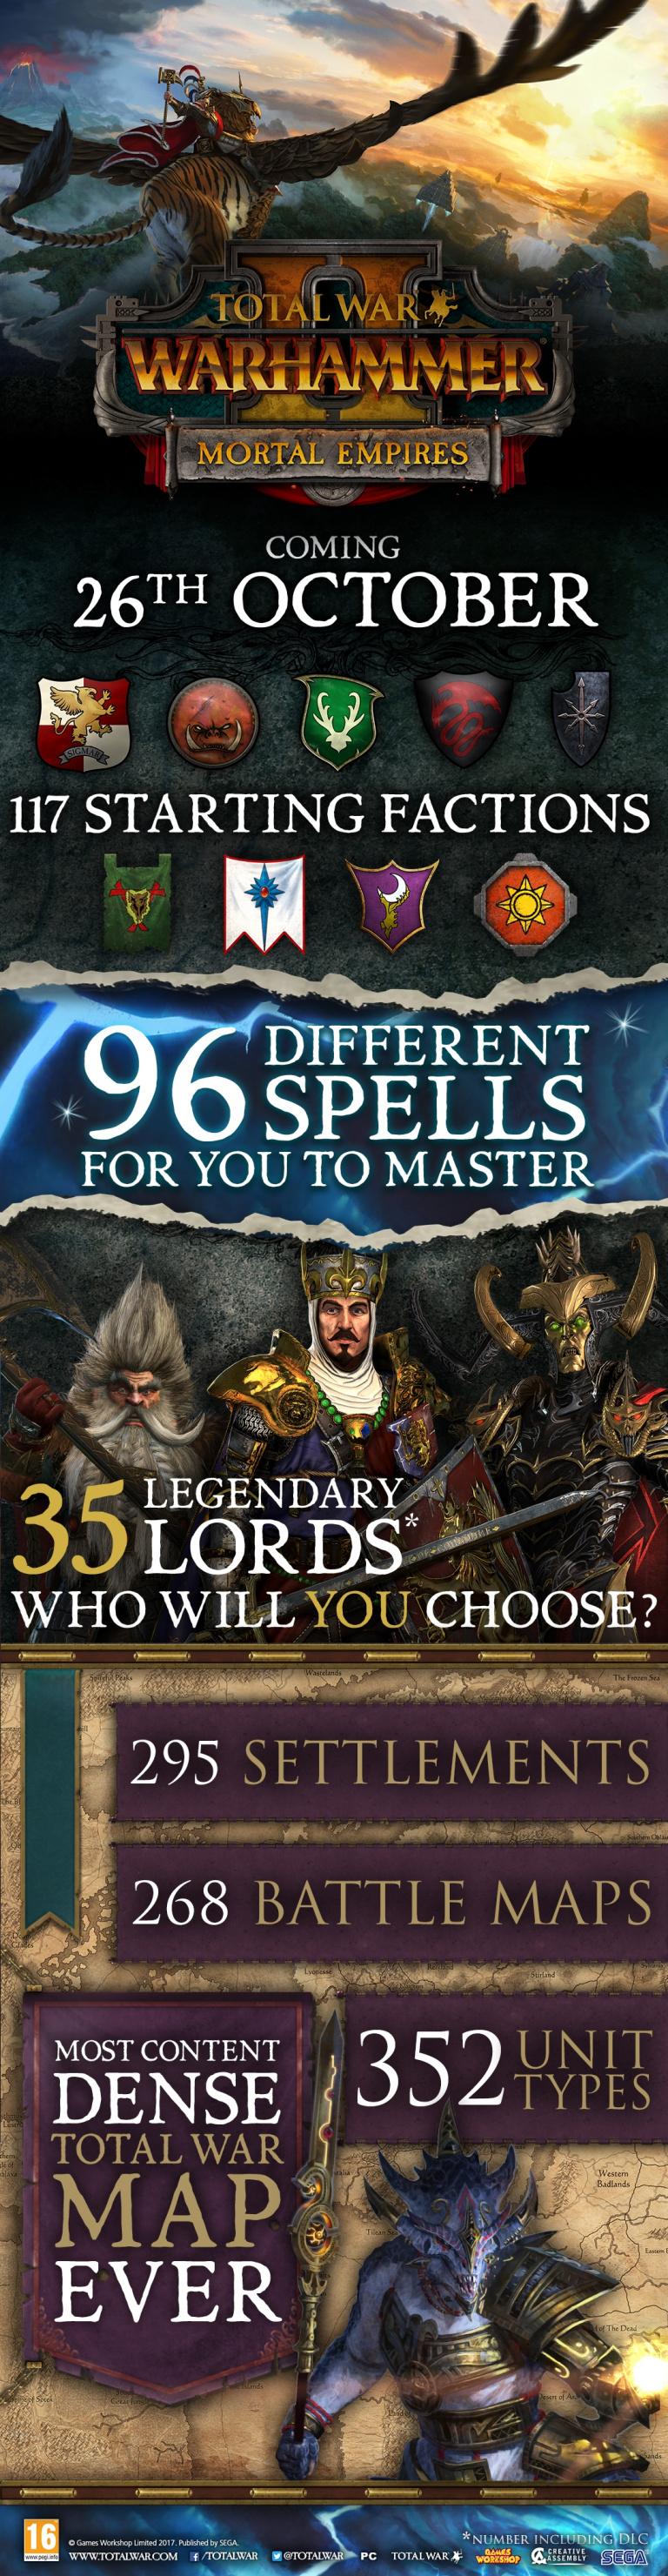 Total War Warhammer : la mise à jour Mortal Empires prend date